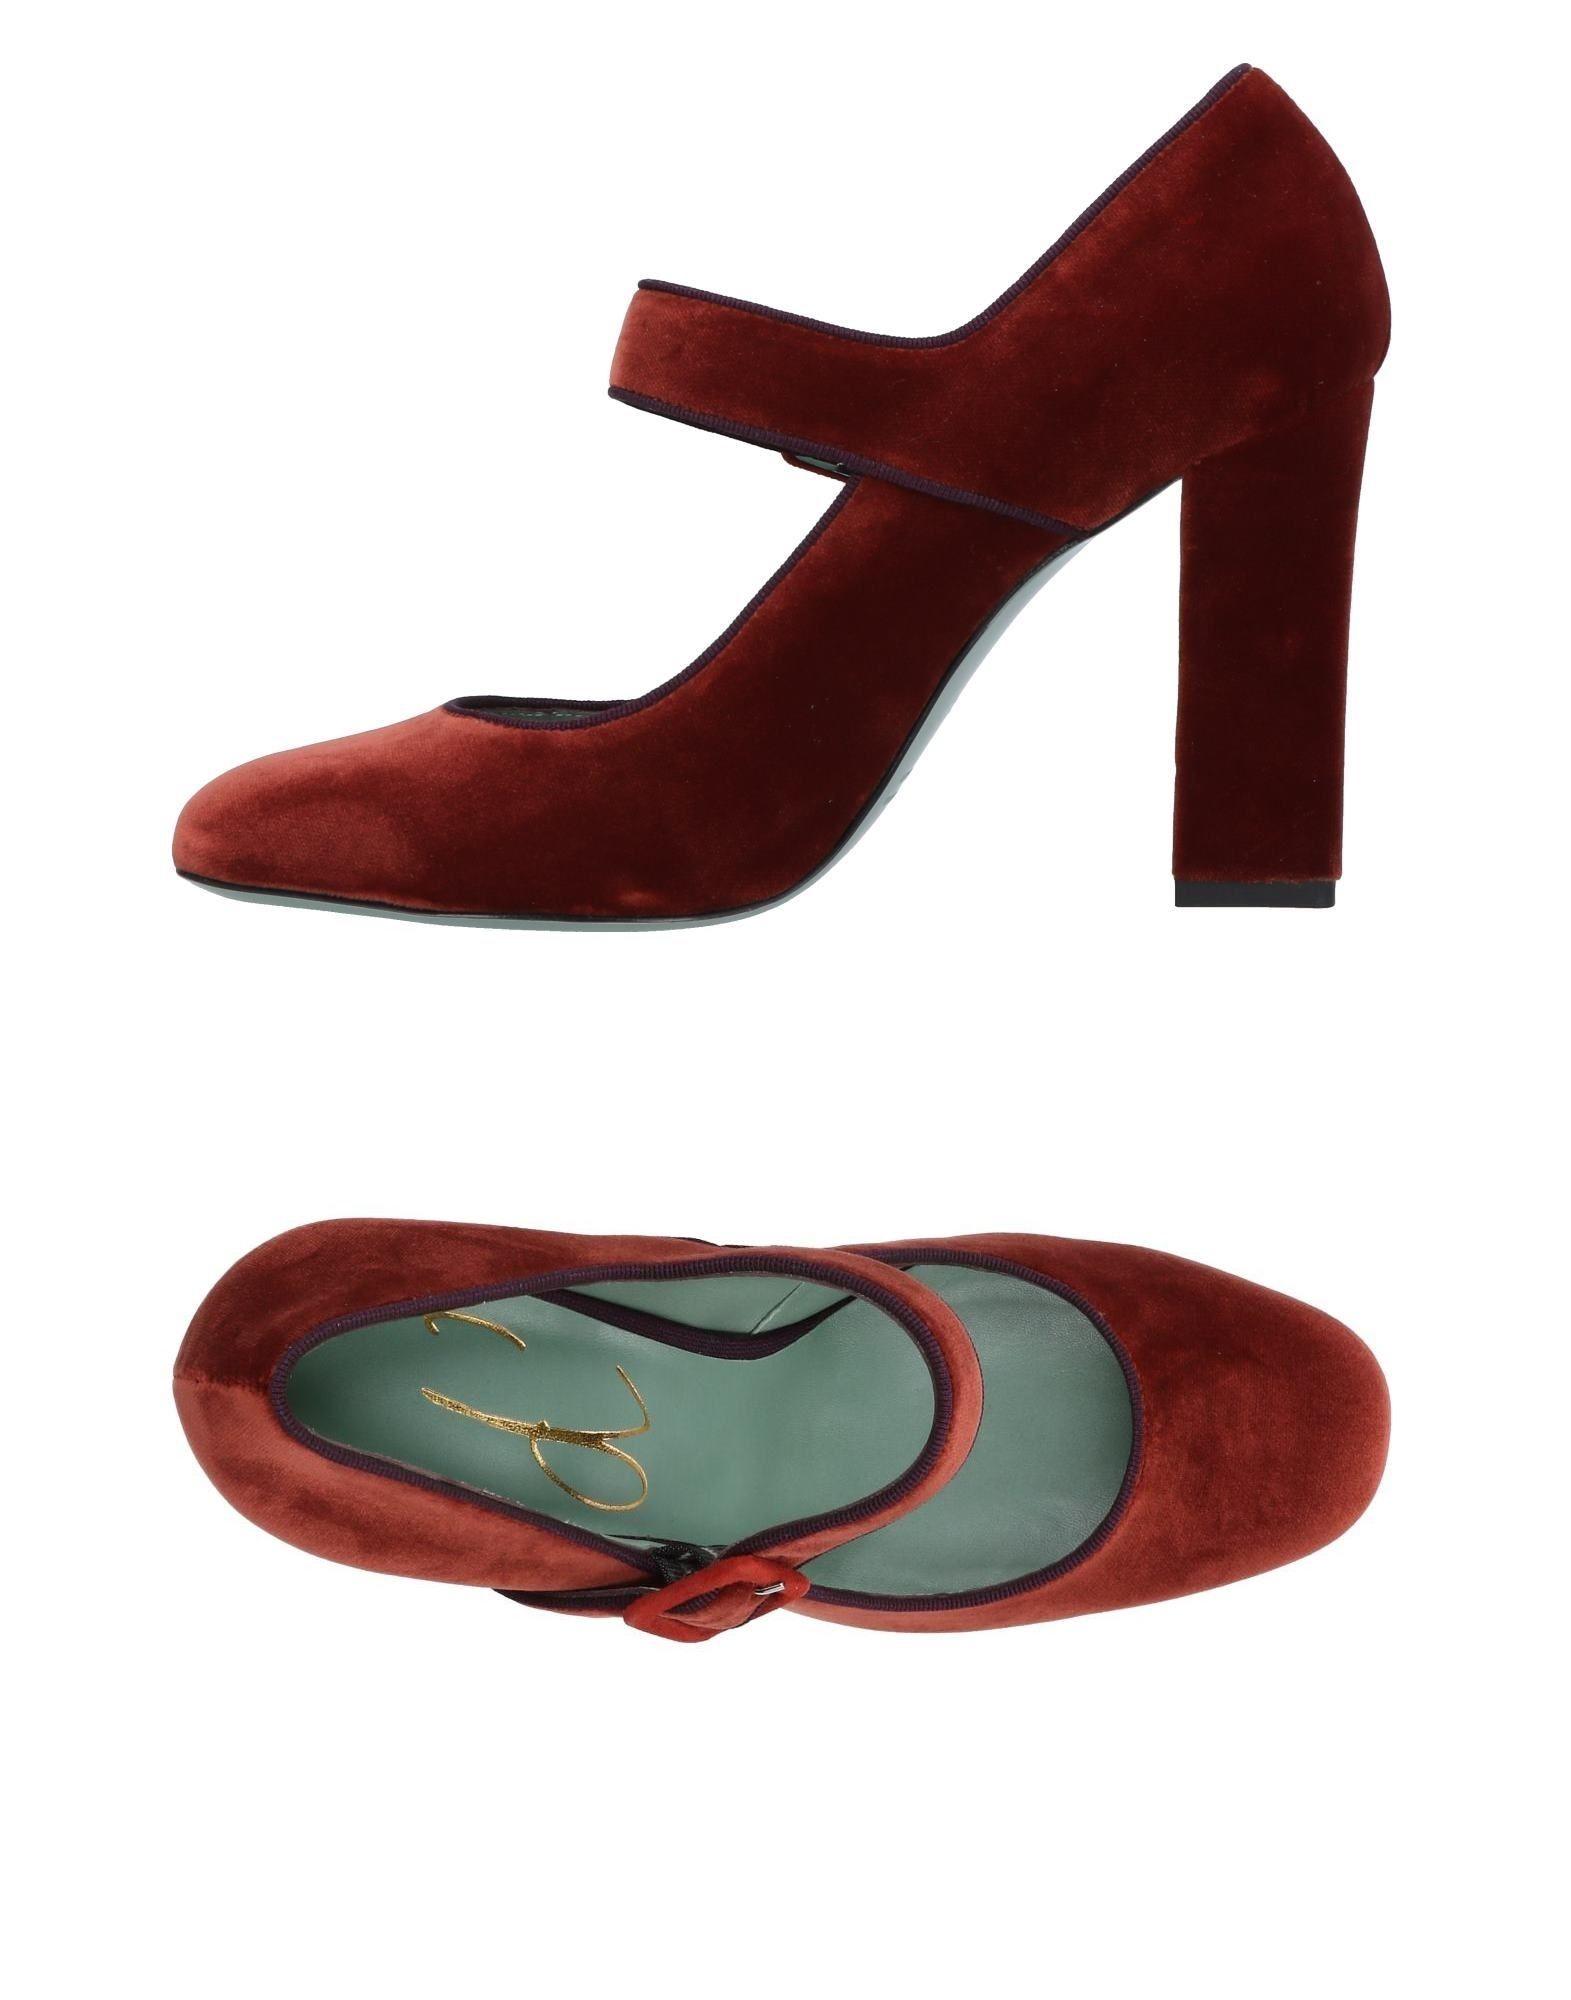 Stilvolle Pumps billige Schuhe Paola D'arcano Pumps Stilvolle Damen  11465915QM 9b0be5